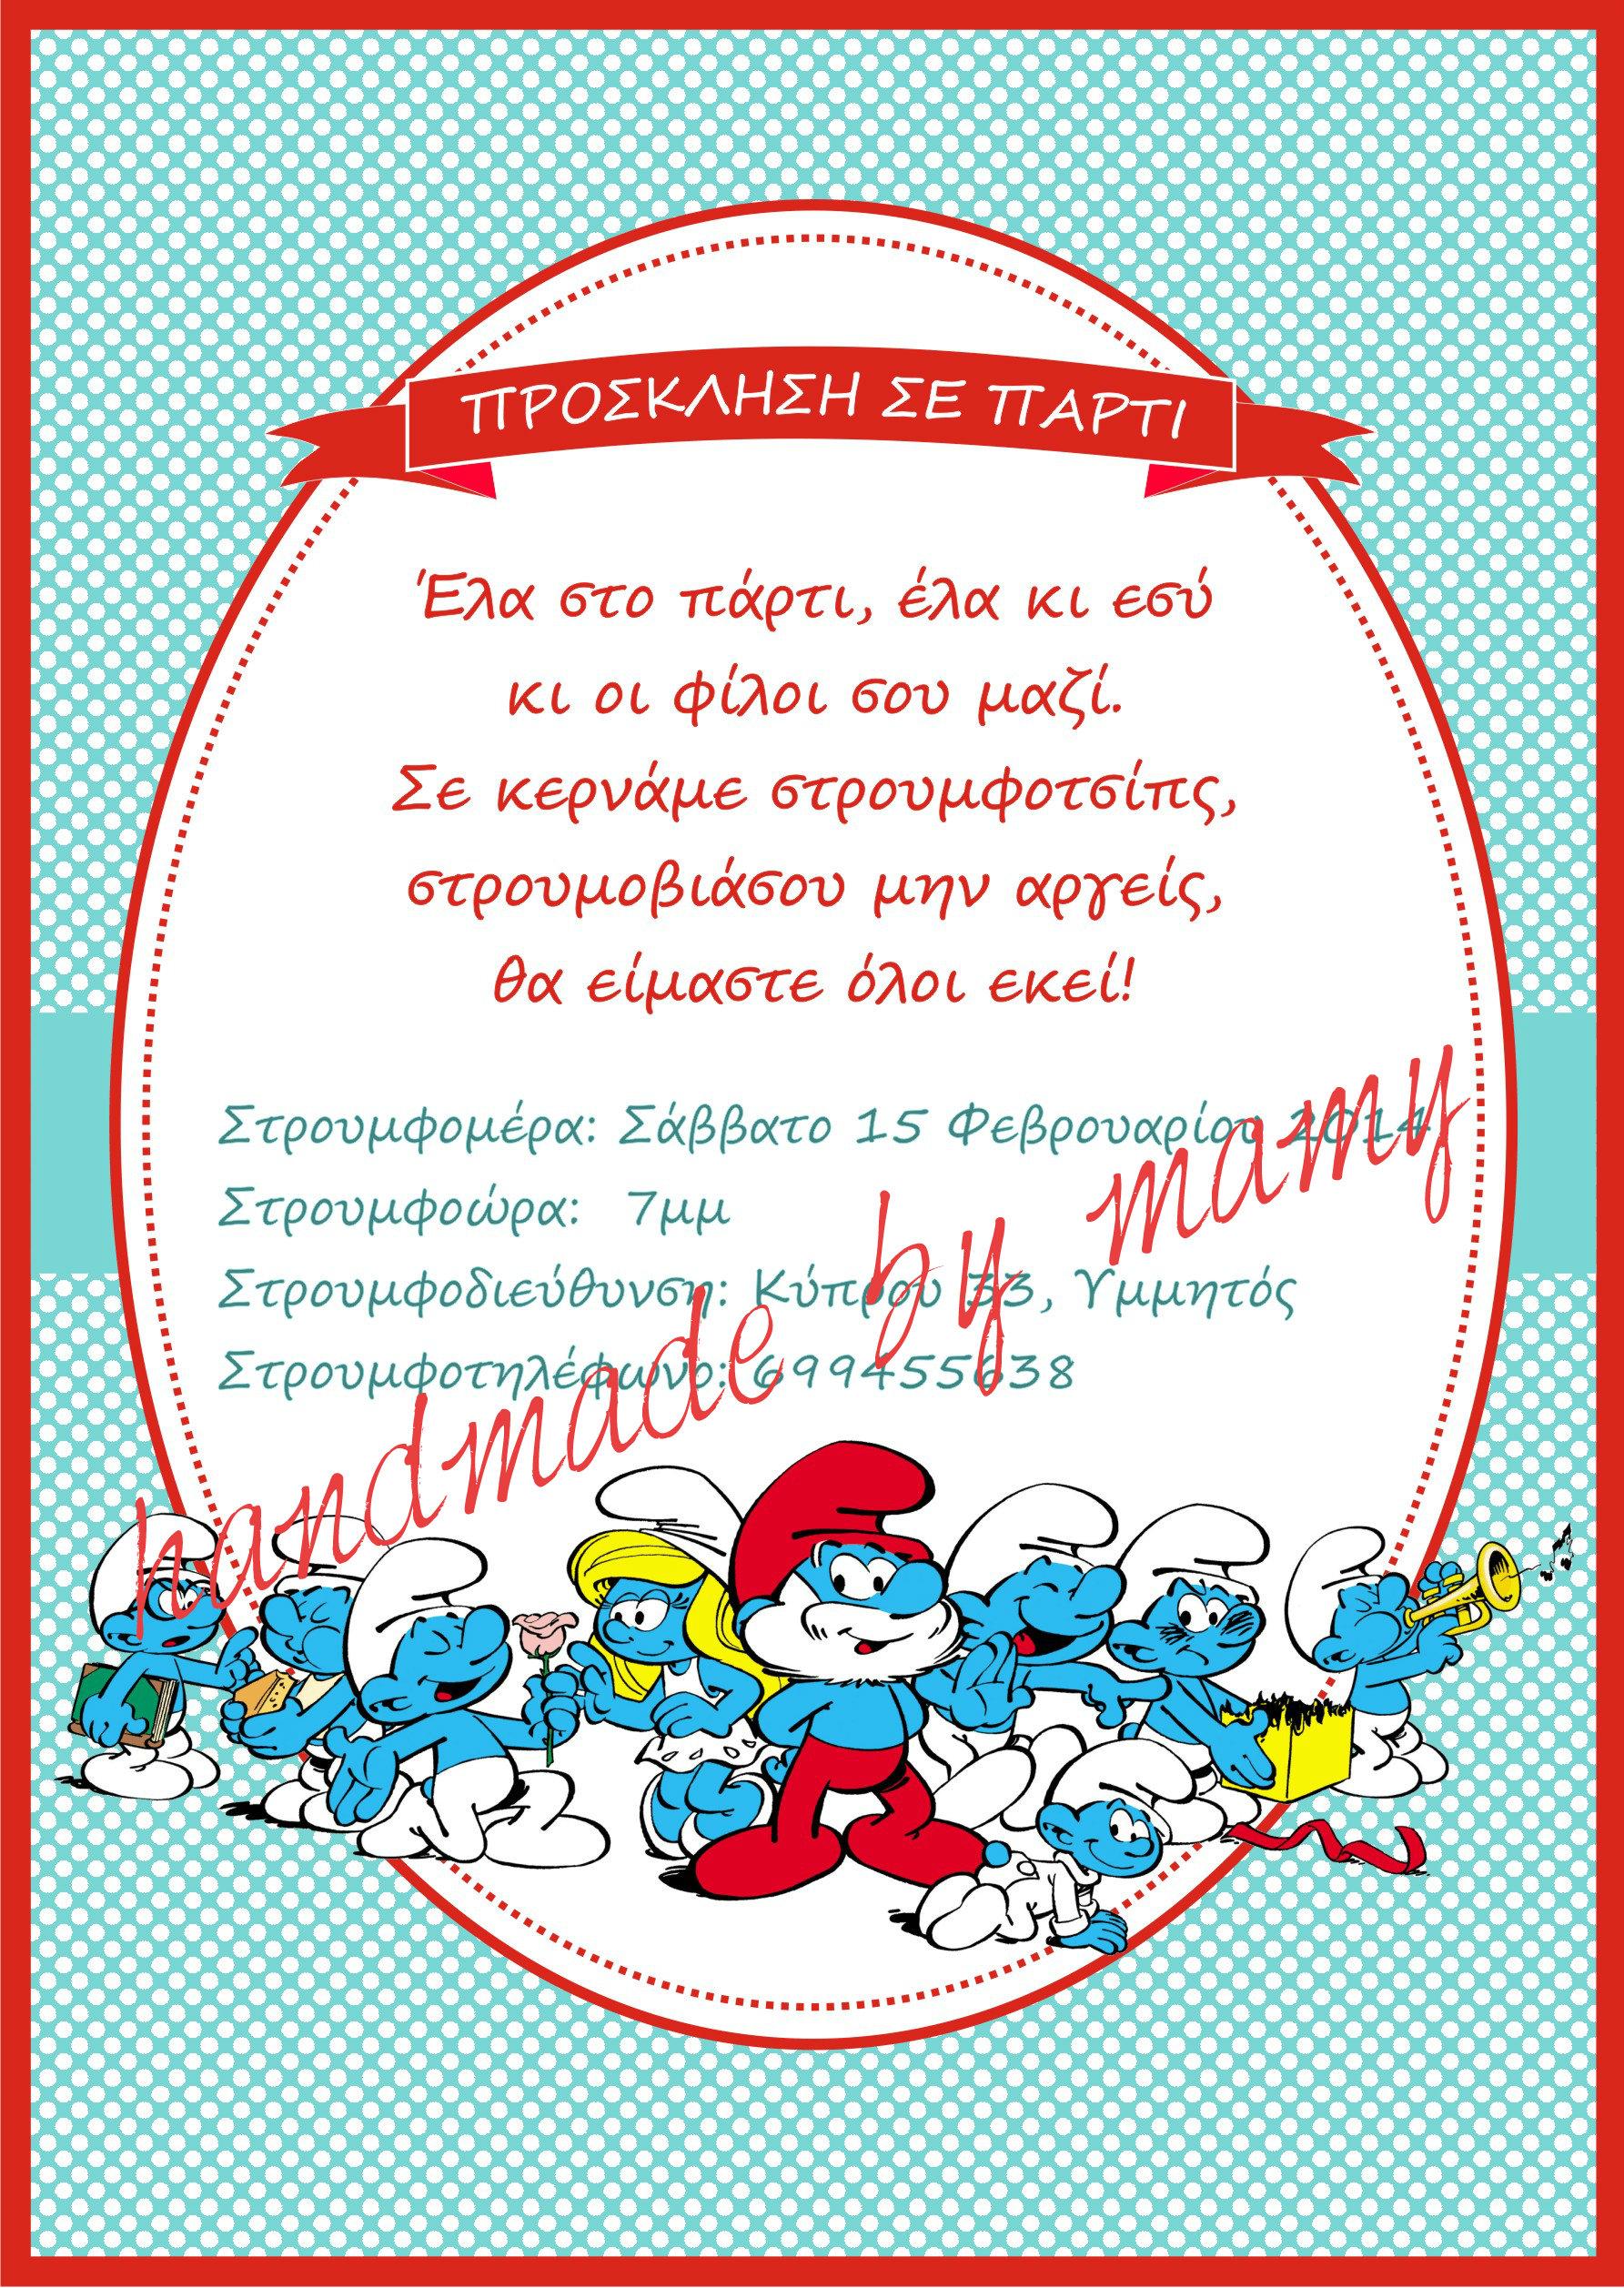 Smurfs Invitation2